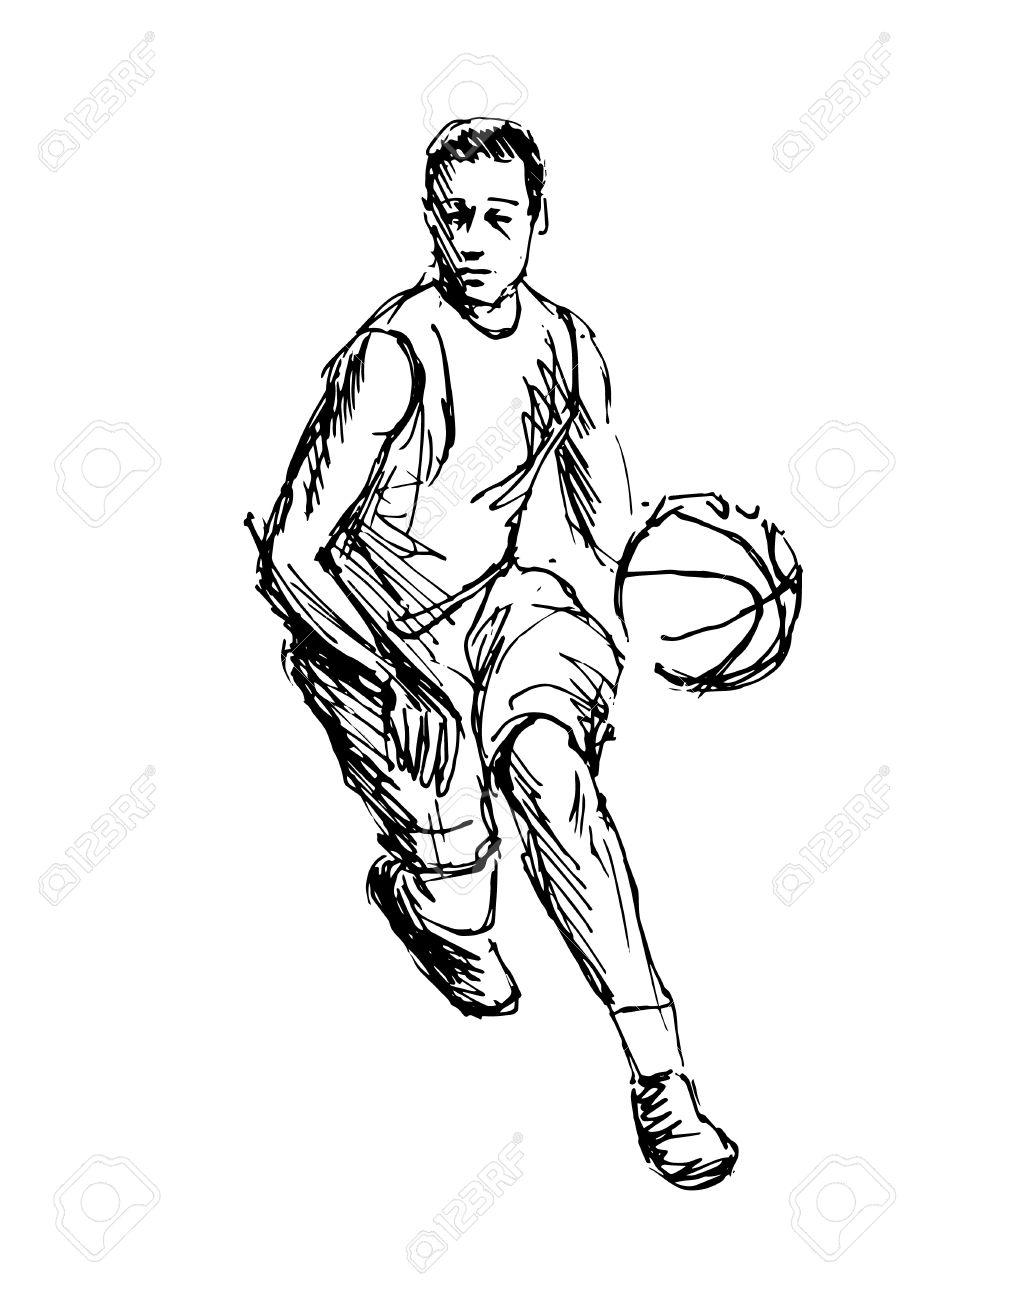 Hand sketch basketball player vector illustration royalty free 79013796 hand sketch basketball player vector illustration photo